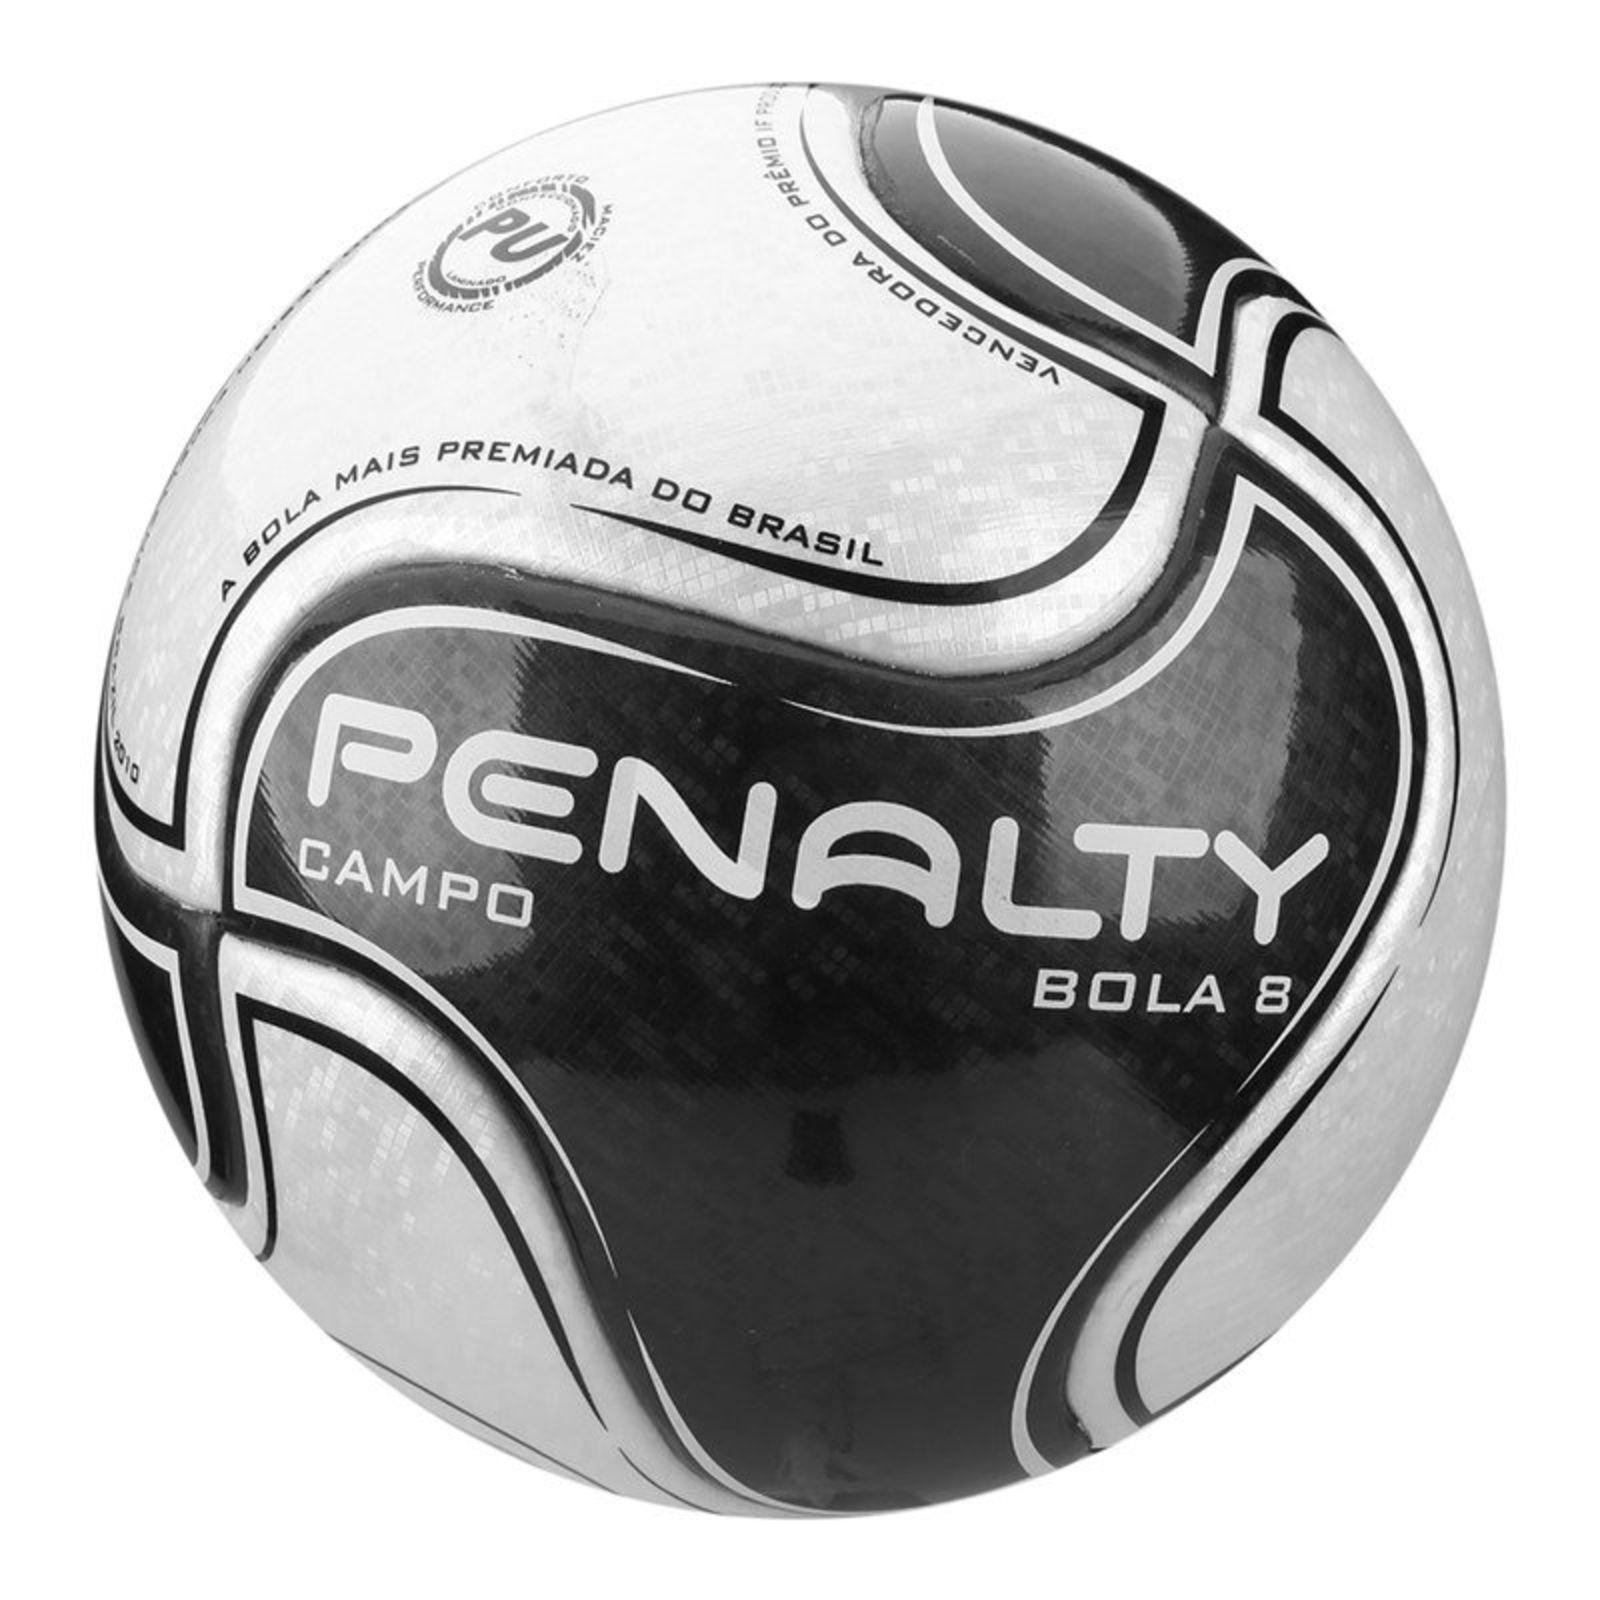 Bola De Futebol Campo Penalty 8 Ix Branco Futebol Esportes E